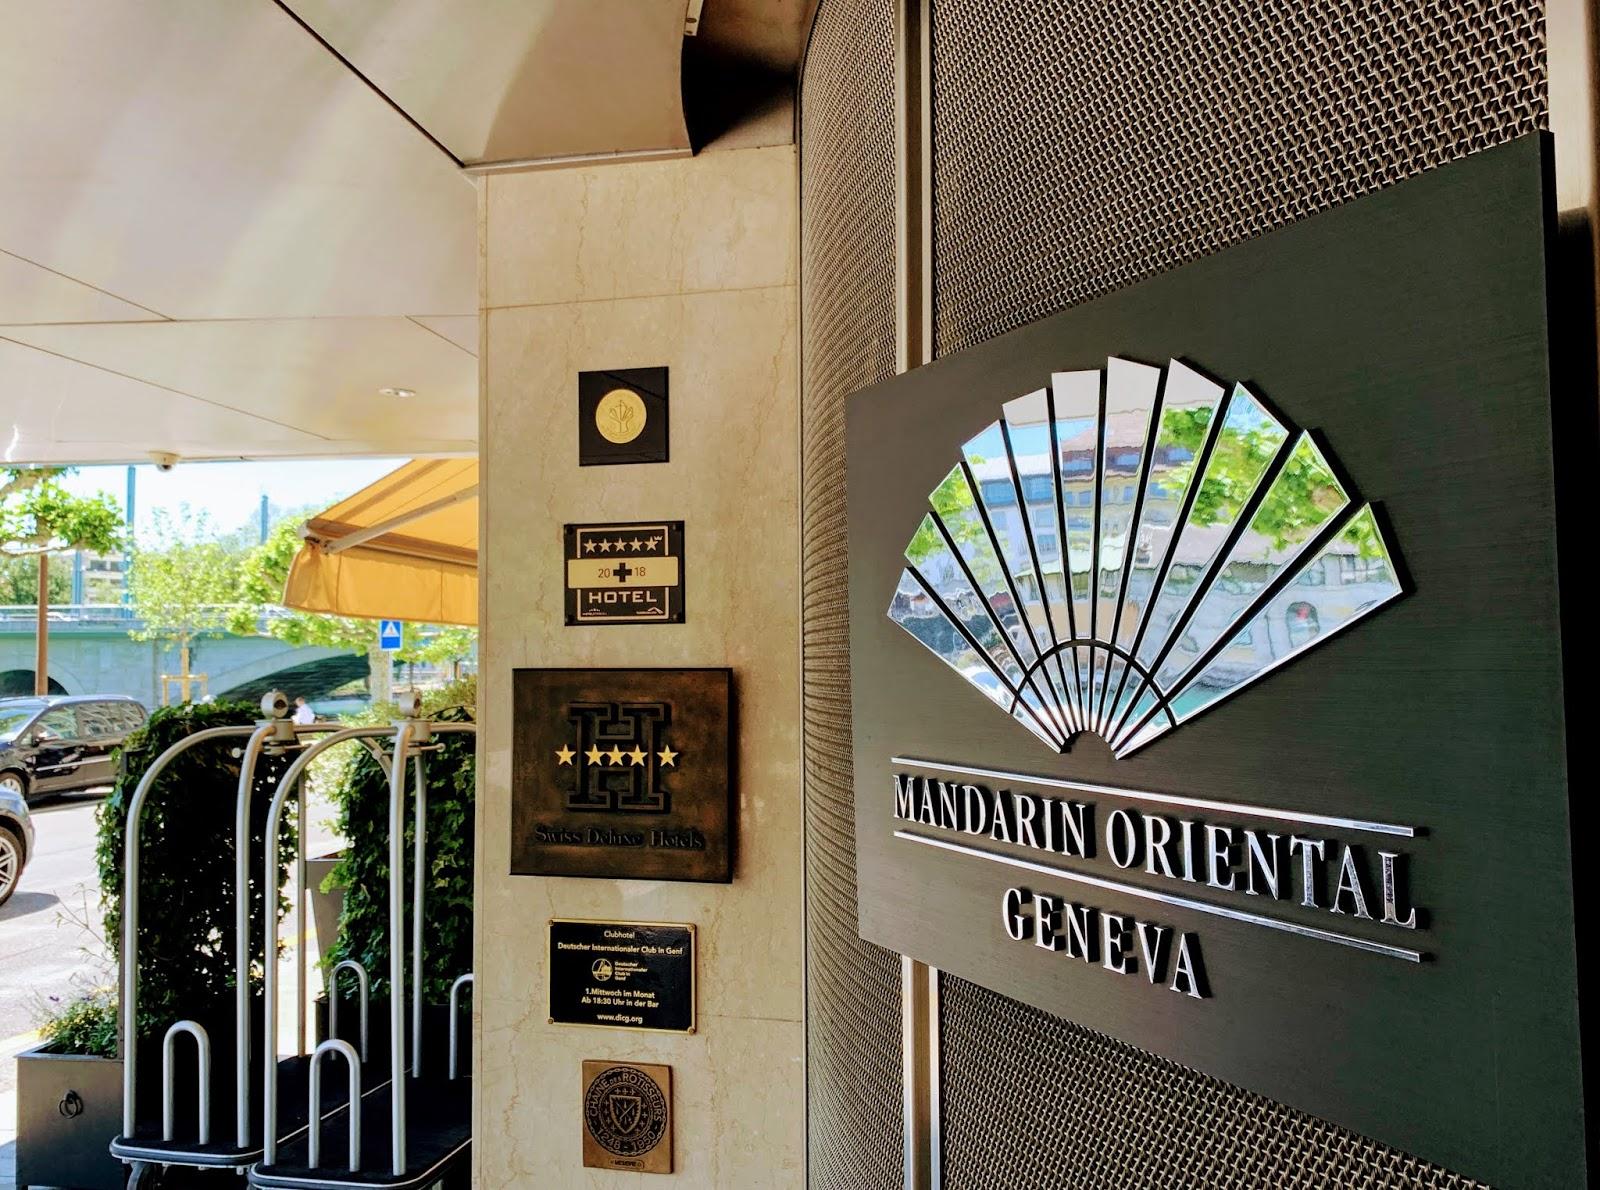 Mandarin oriental geneva entrance